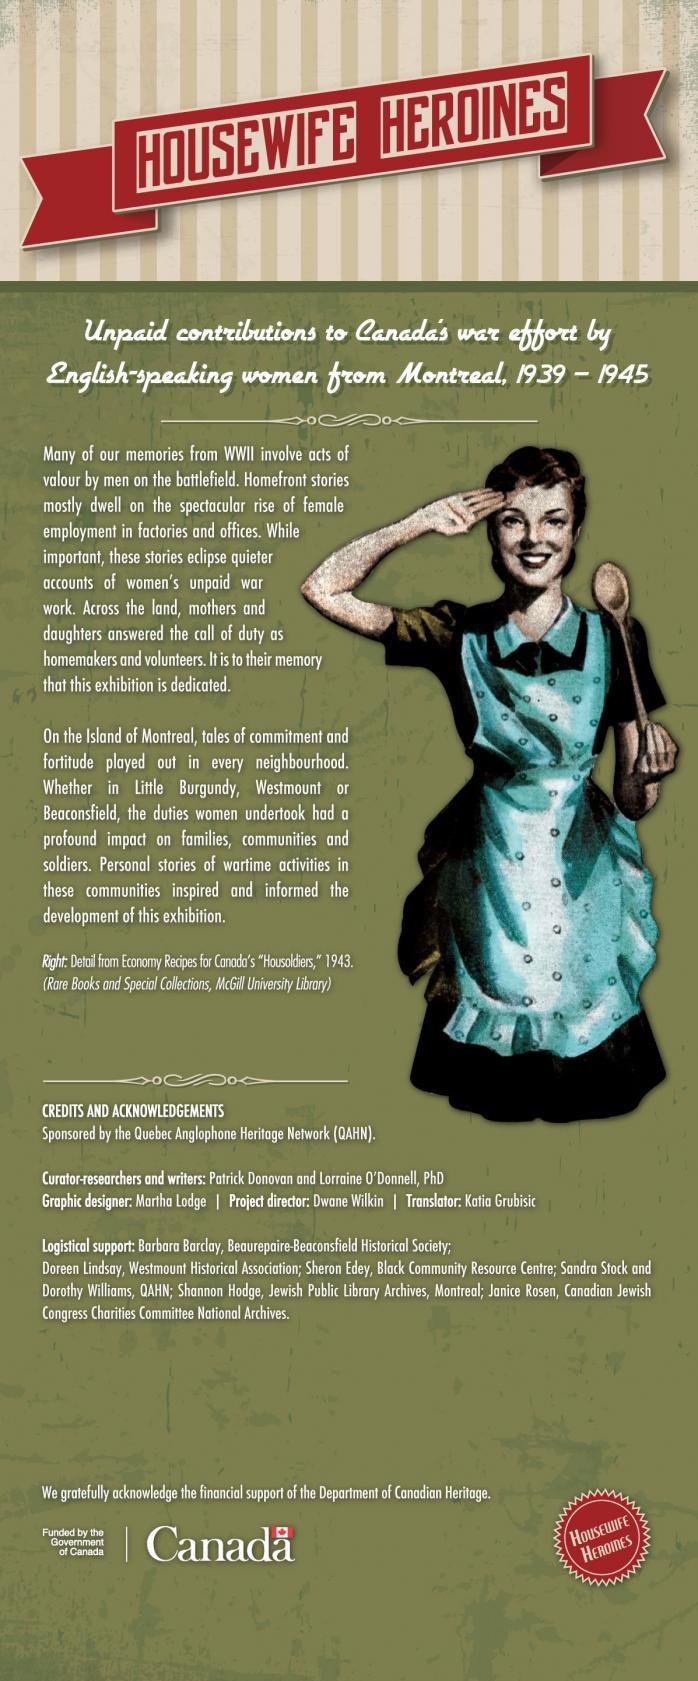 1: Housewife Heroines of World War II